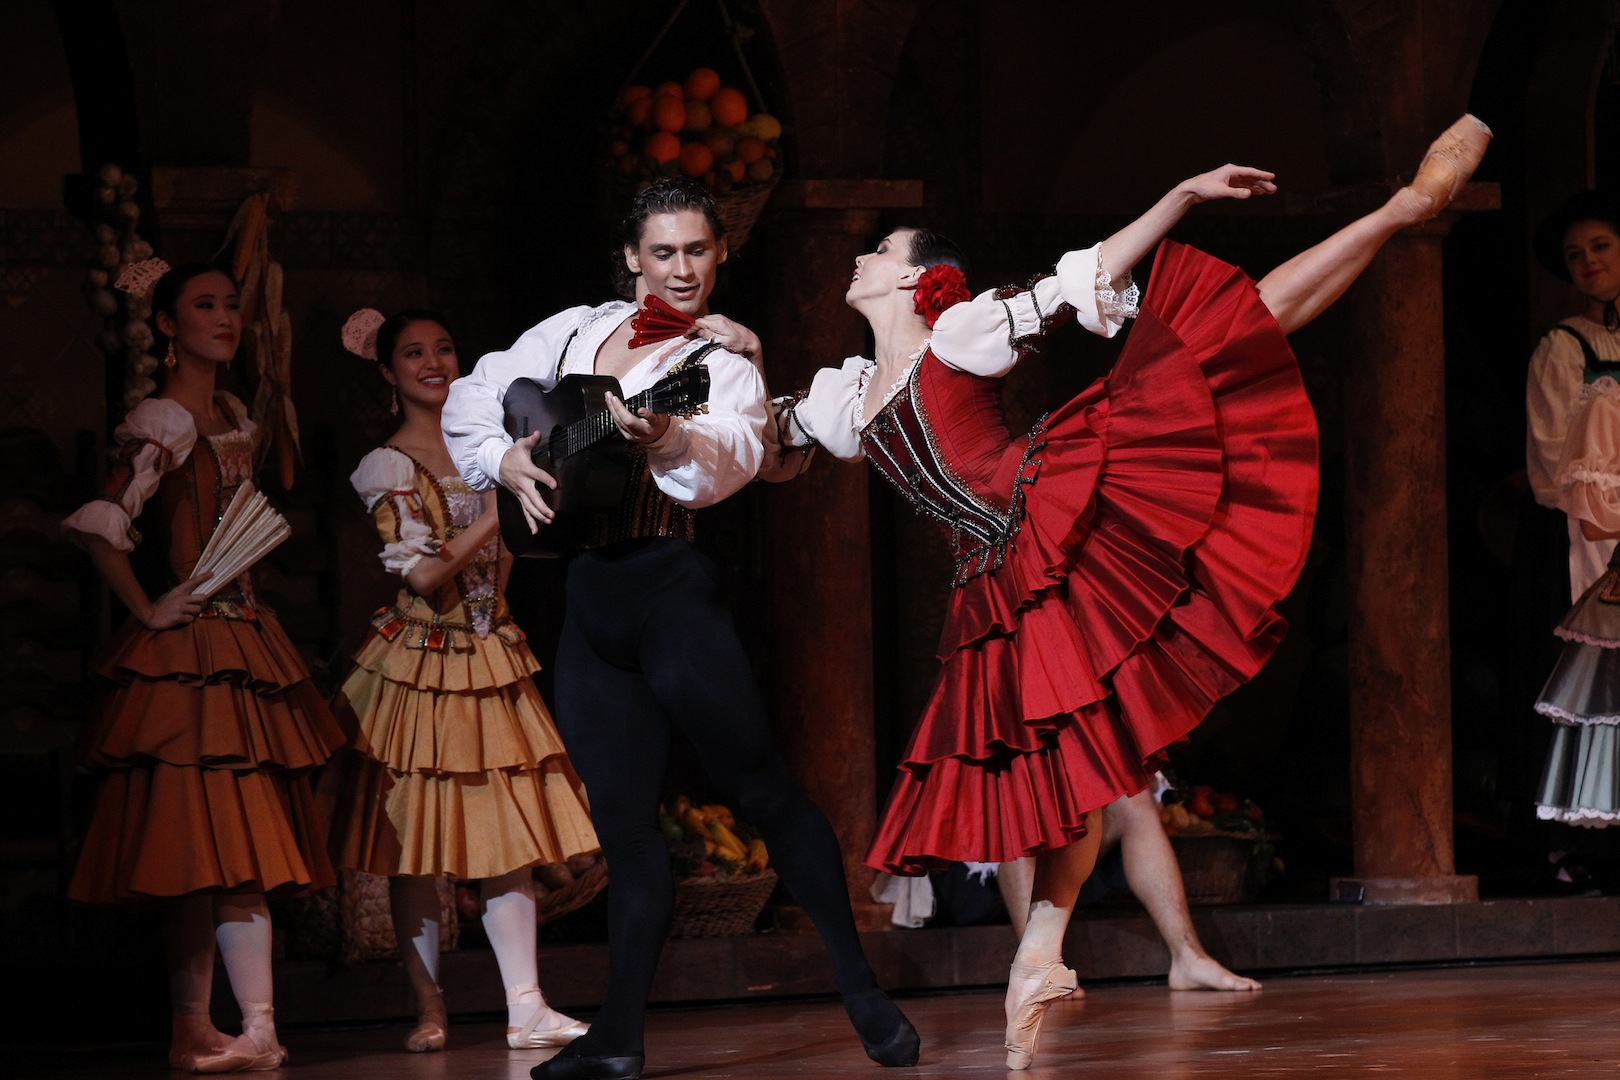 Ivan-Vasilliev-and-Natalia-Osipova-in-Don-Quixote-The-Australian-Ballet-2013-Photo-by-Jeff-Busby